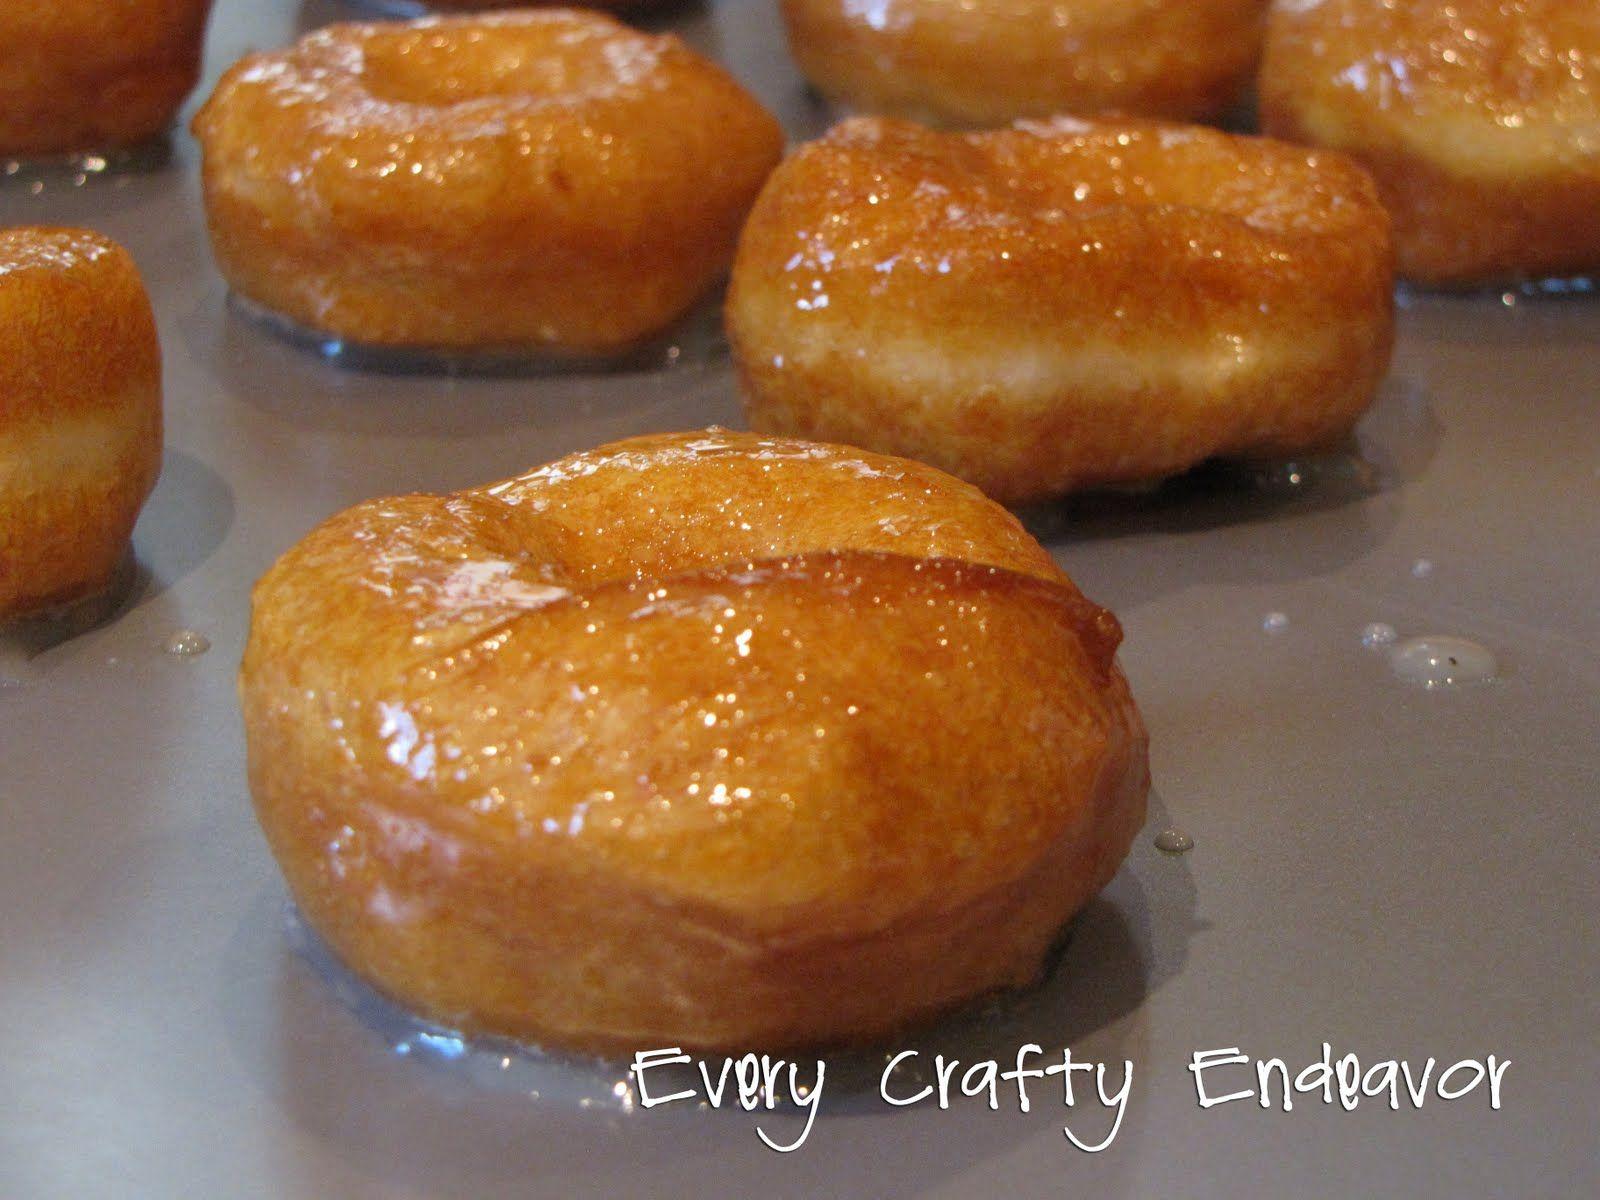 Every Creative Endeavor: Super Easy Peasy Doughnuts